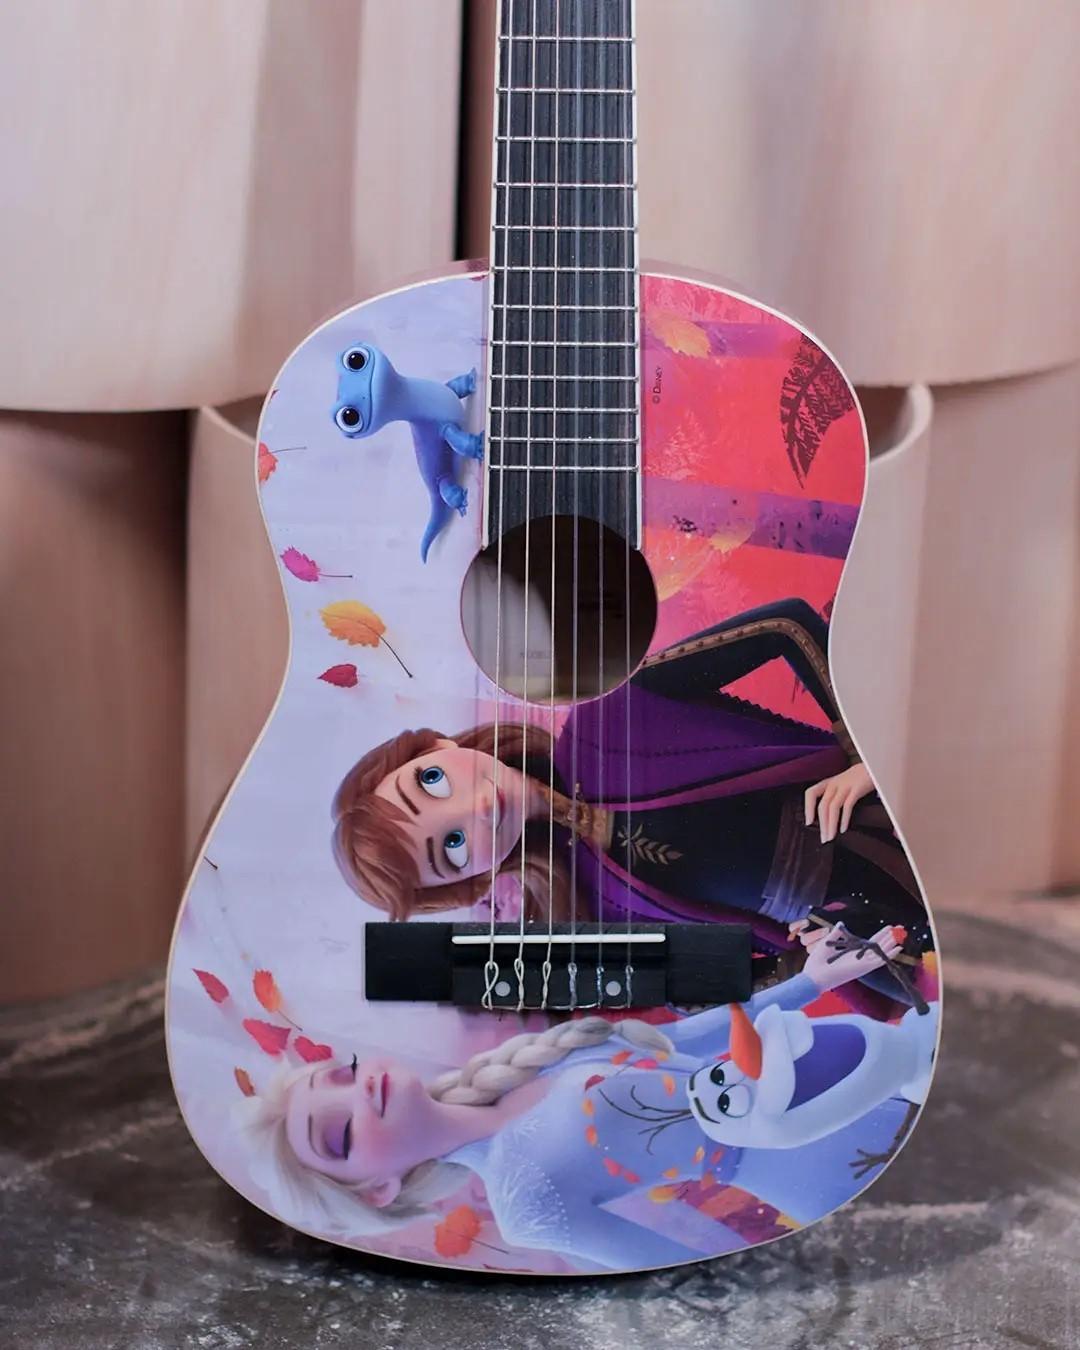 Violão Infantil PHX Disney Frozen 2 Elsa, Anna e Olaf - VIF-3